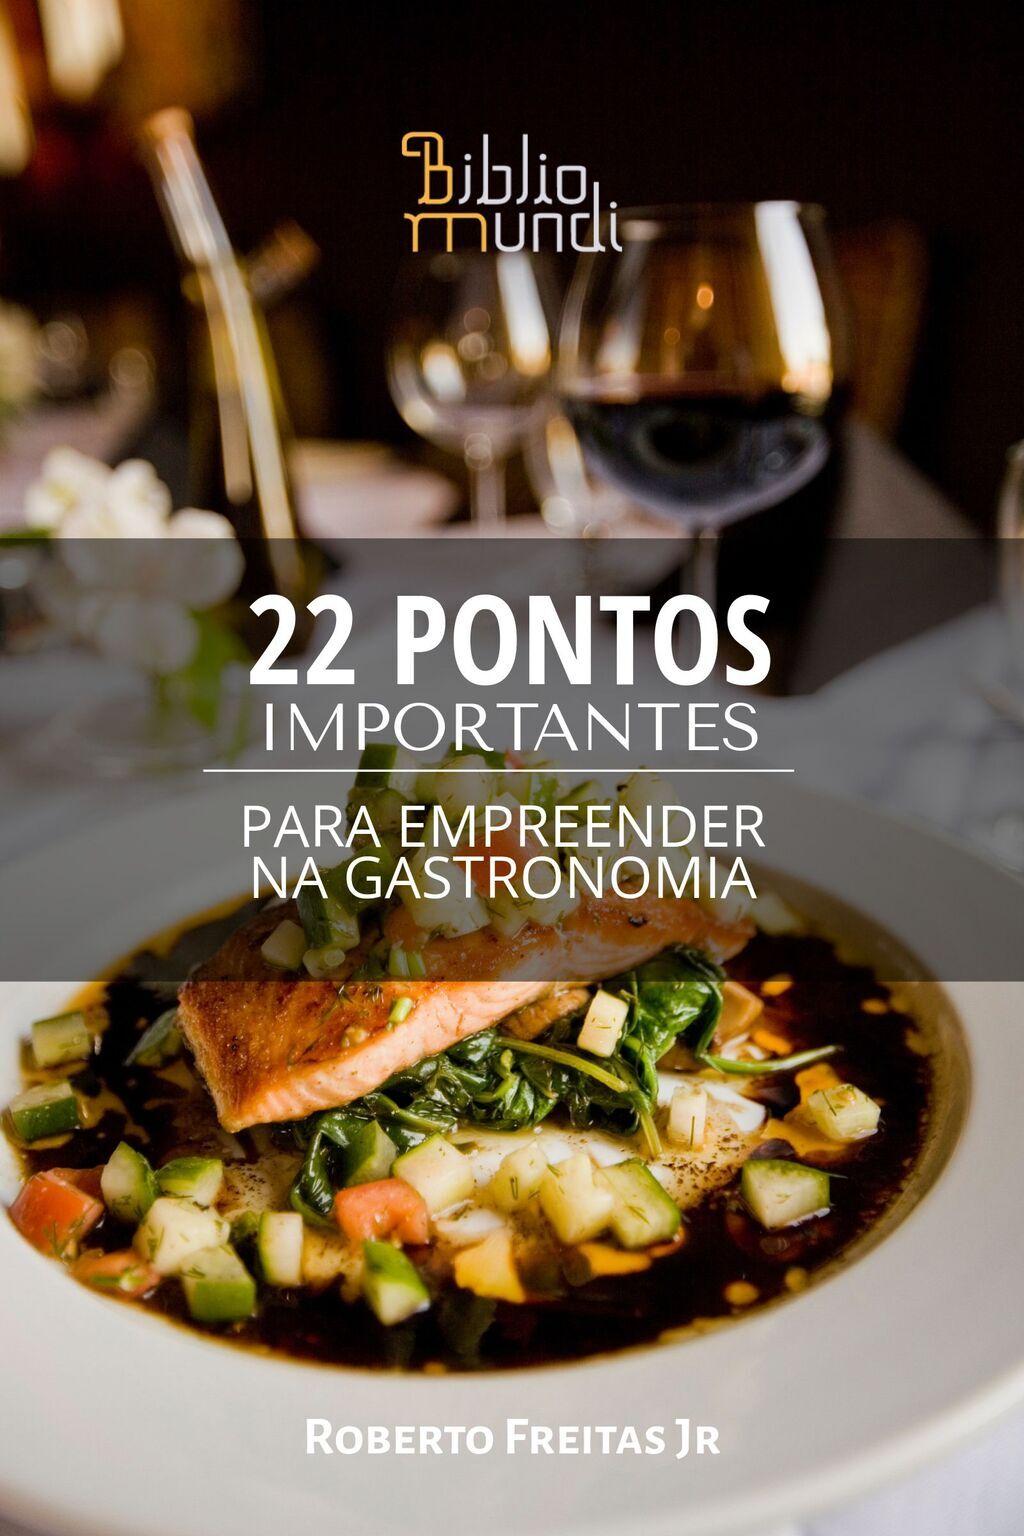 22 Pontos Importantes Para Empreender na Gastronomia